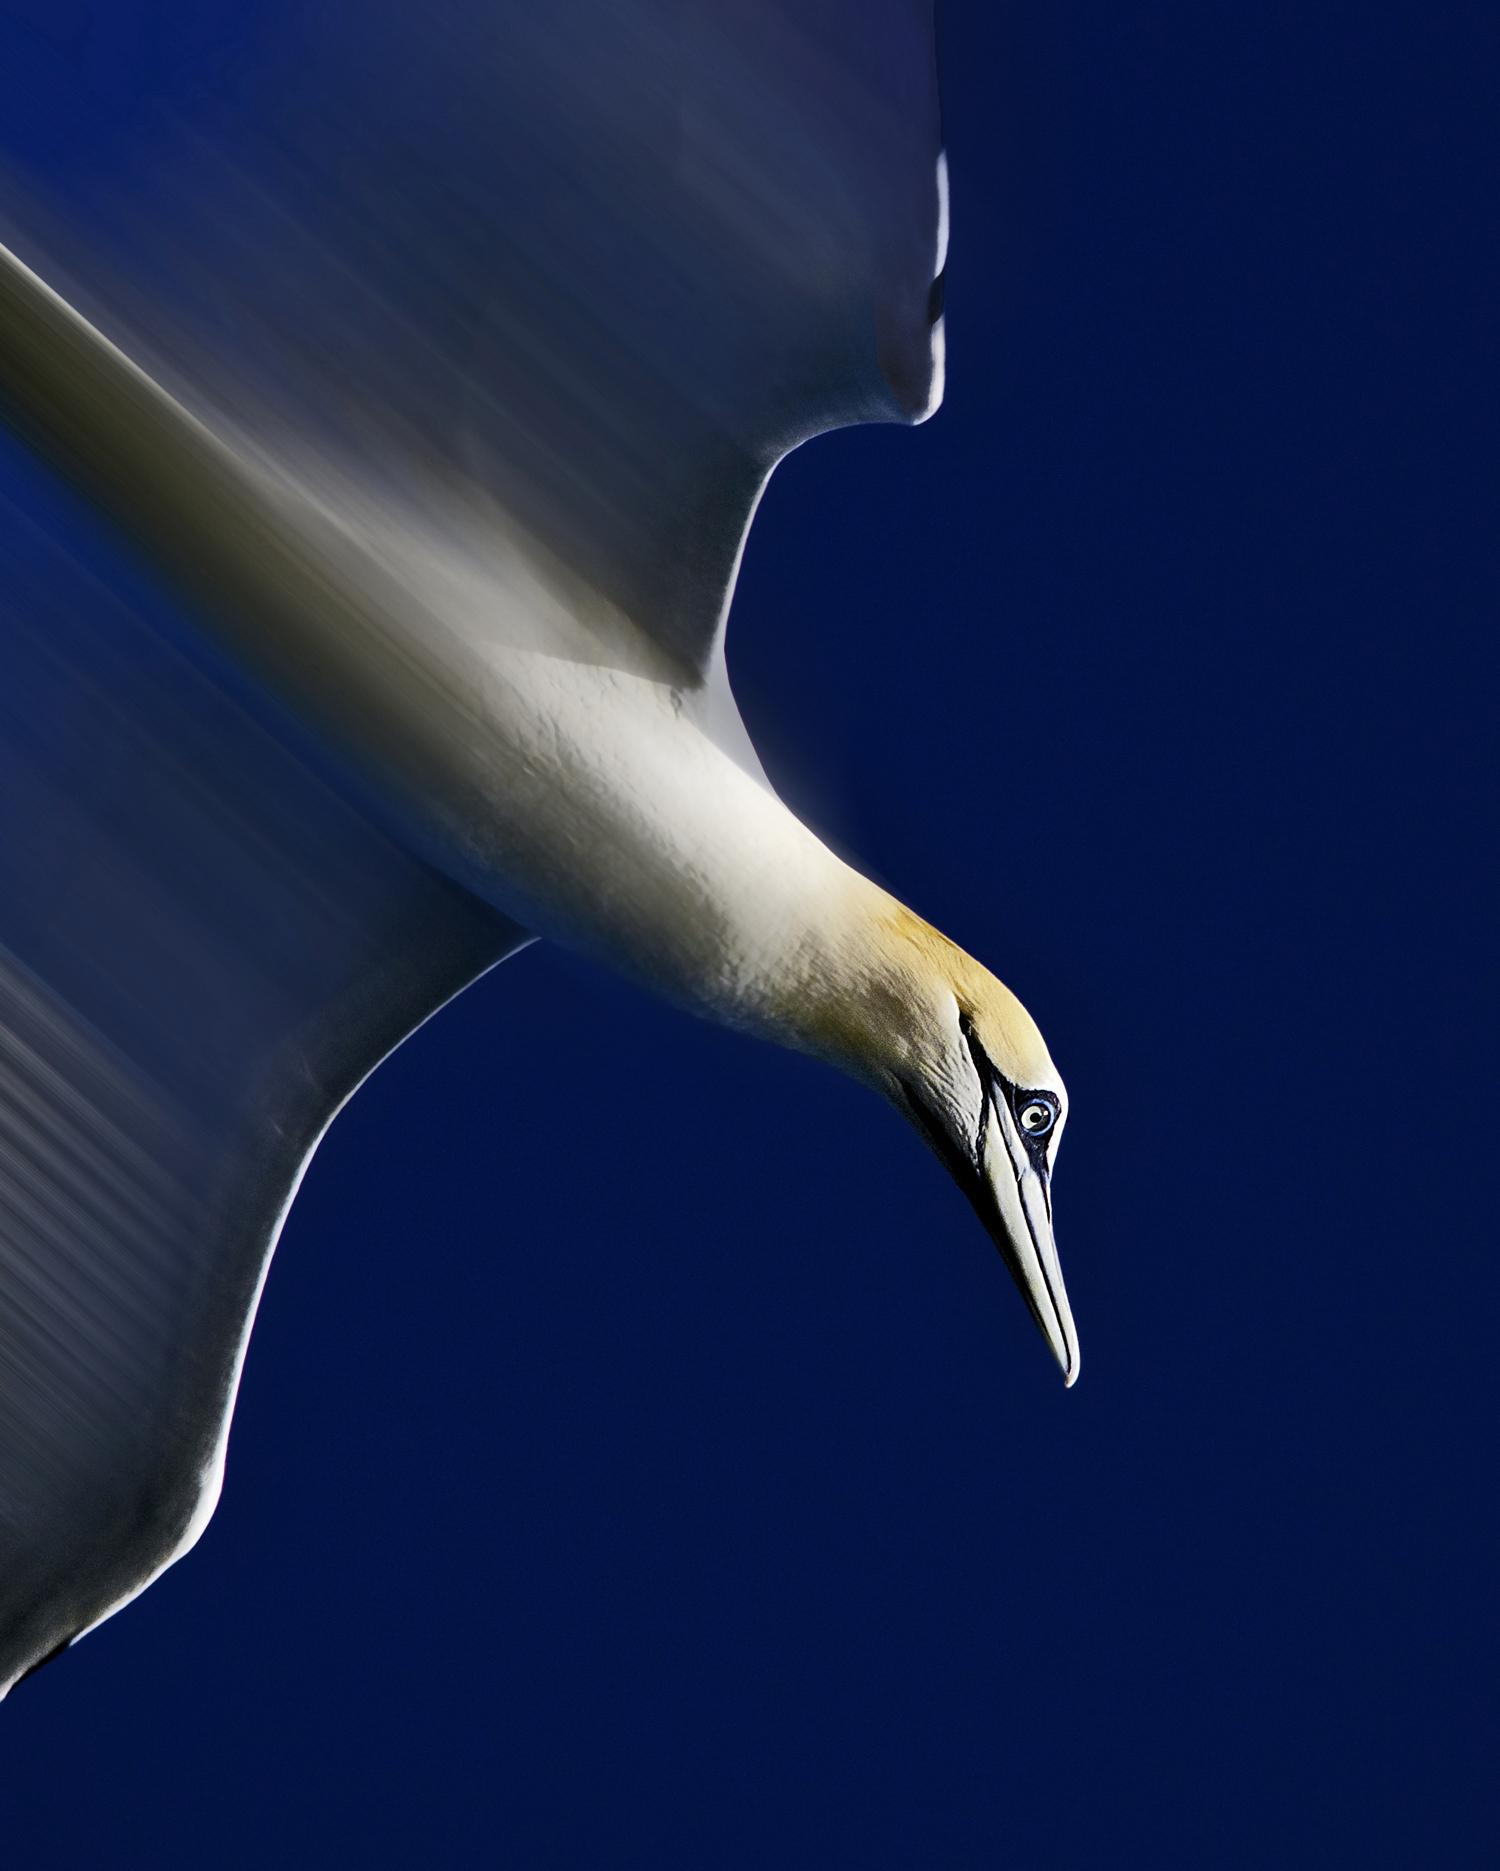 Diving Gannet. - Pentax User Photo Gallery